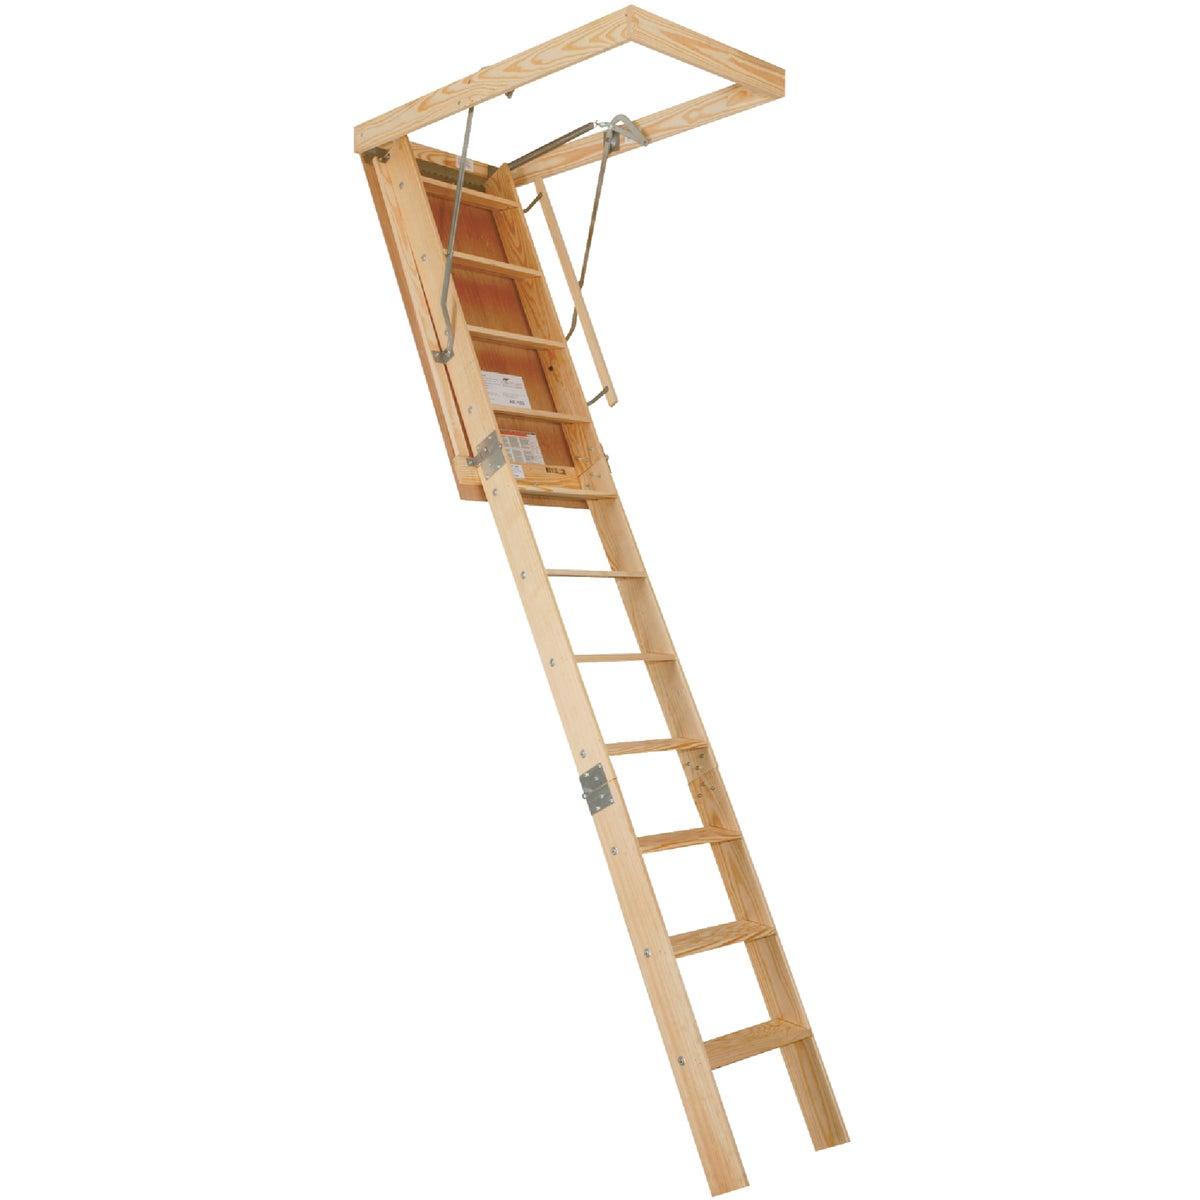 25.5X54X120 Pm Atc Stair